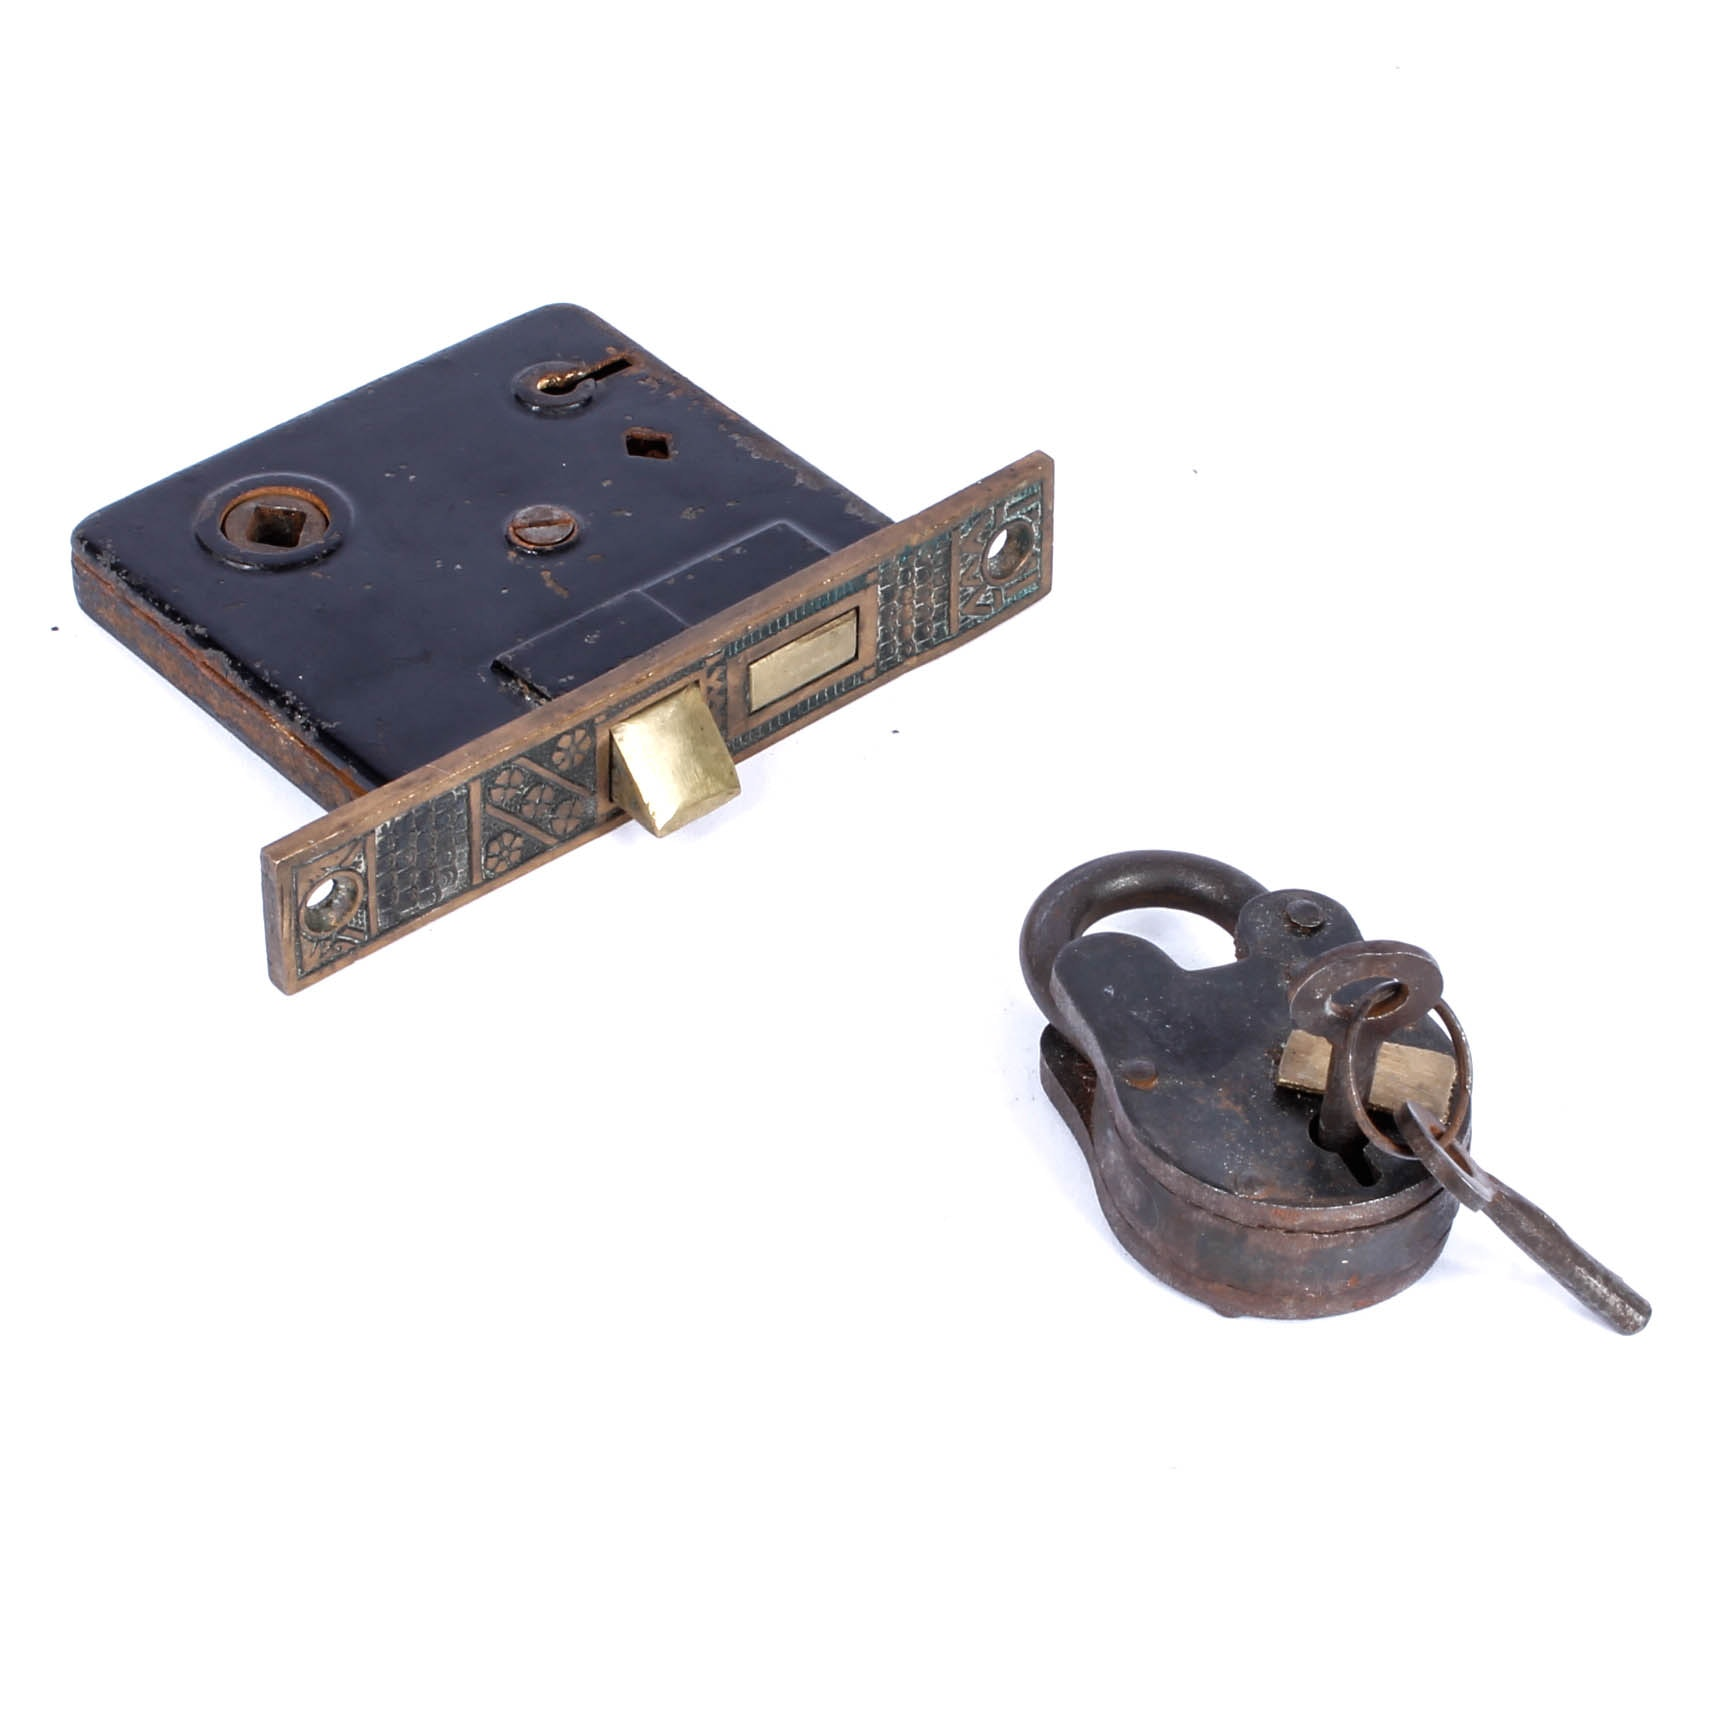 Vintage Lock and Hardware